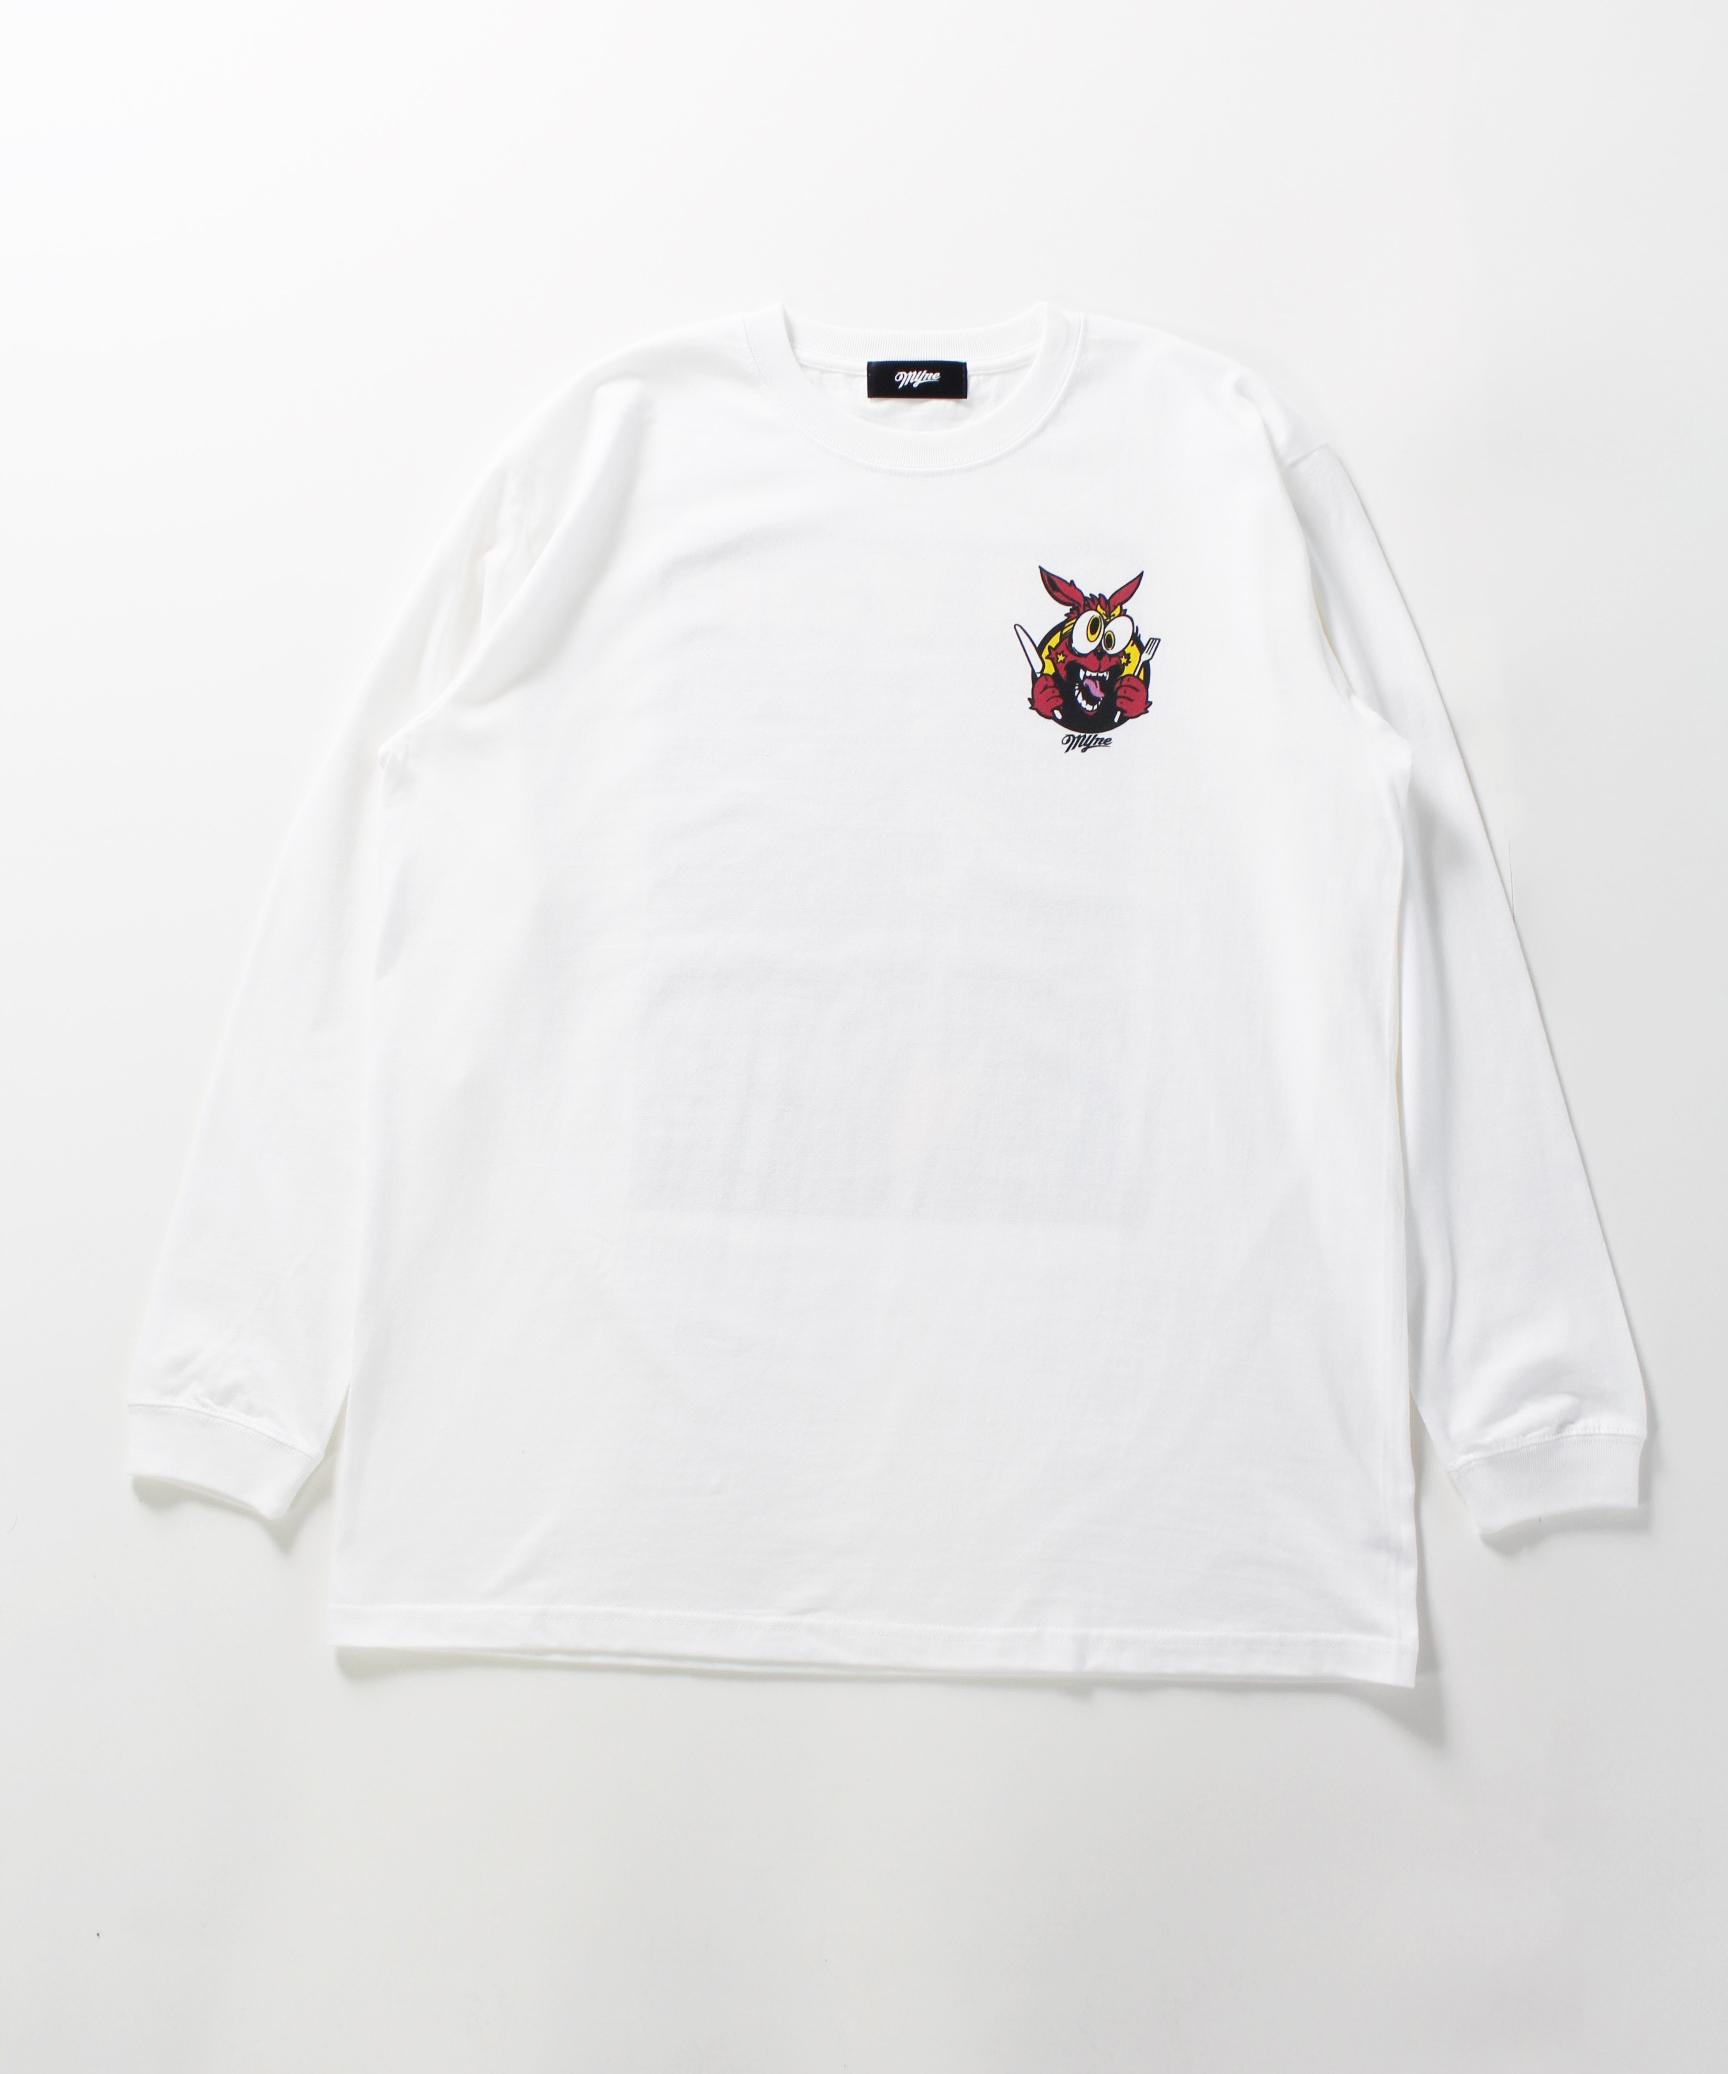 MYne CODEX 別注 L/S T-shirt / WHITE - 画像1